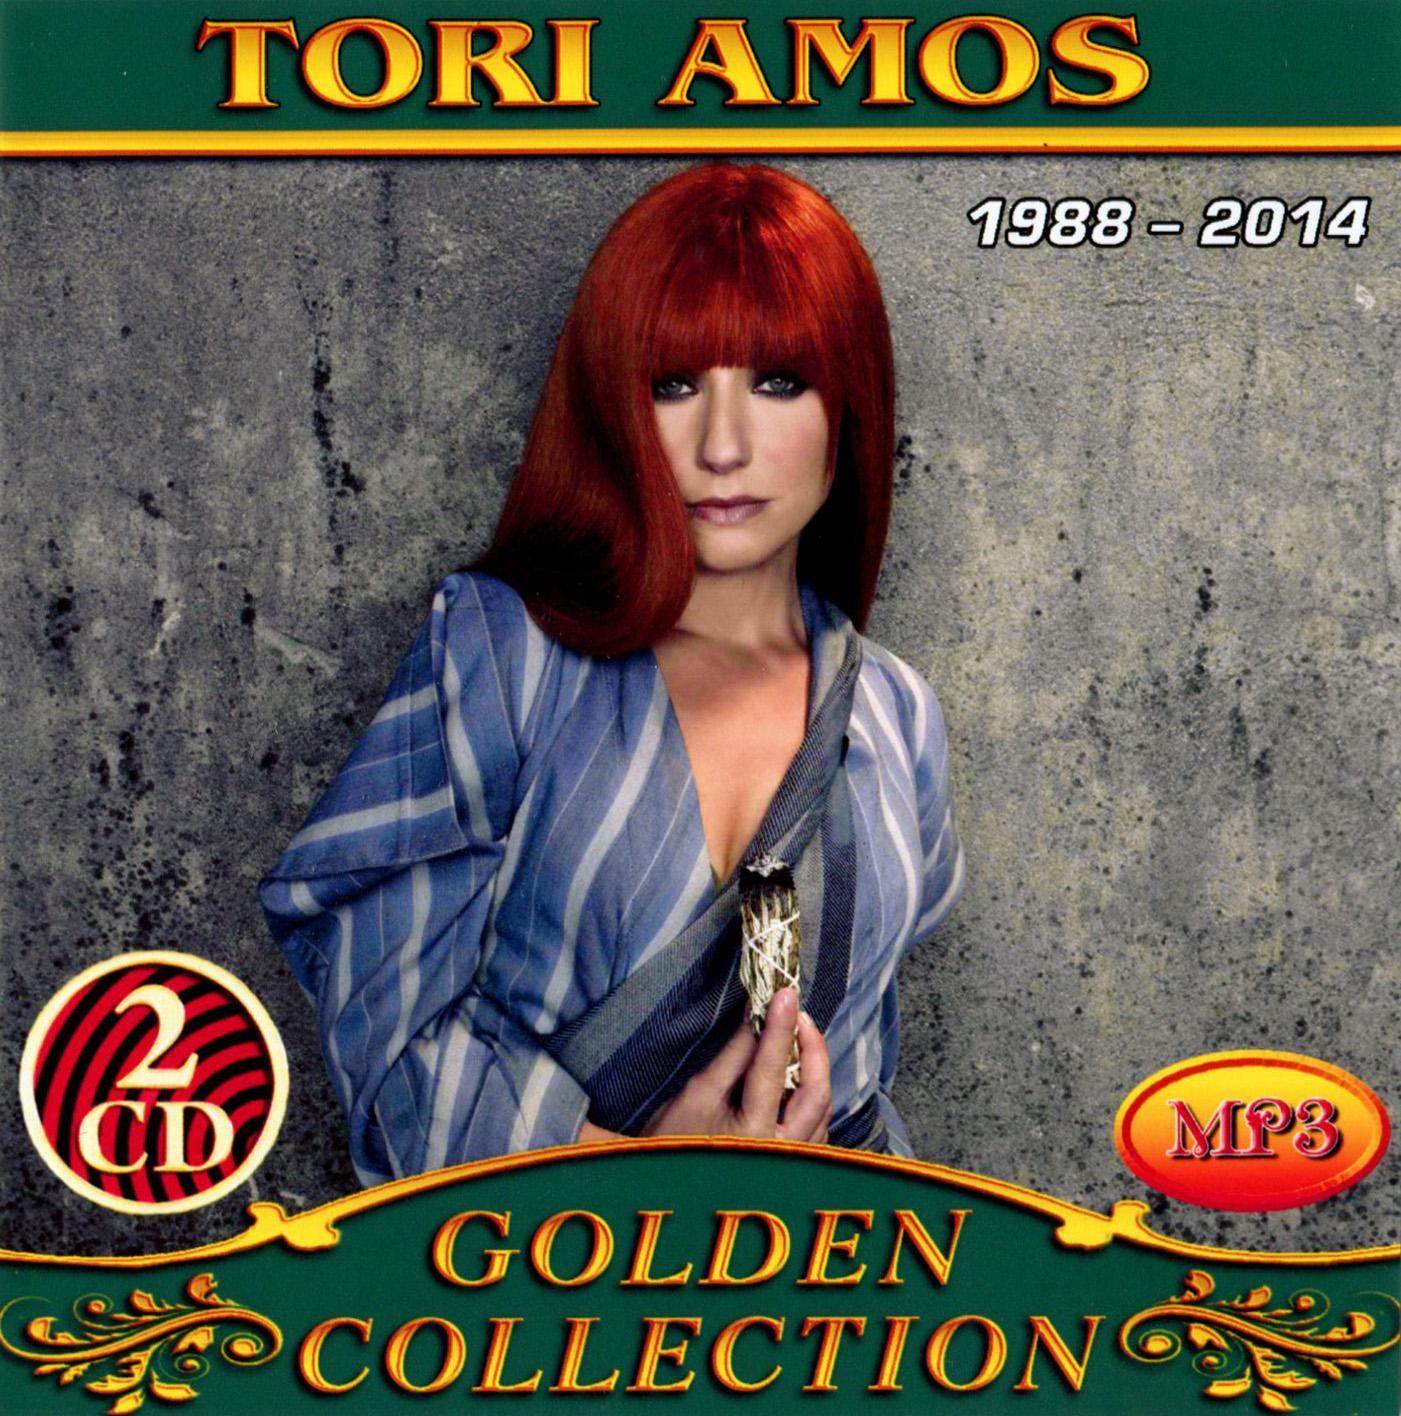 Tori Amos 2cd [mp3]